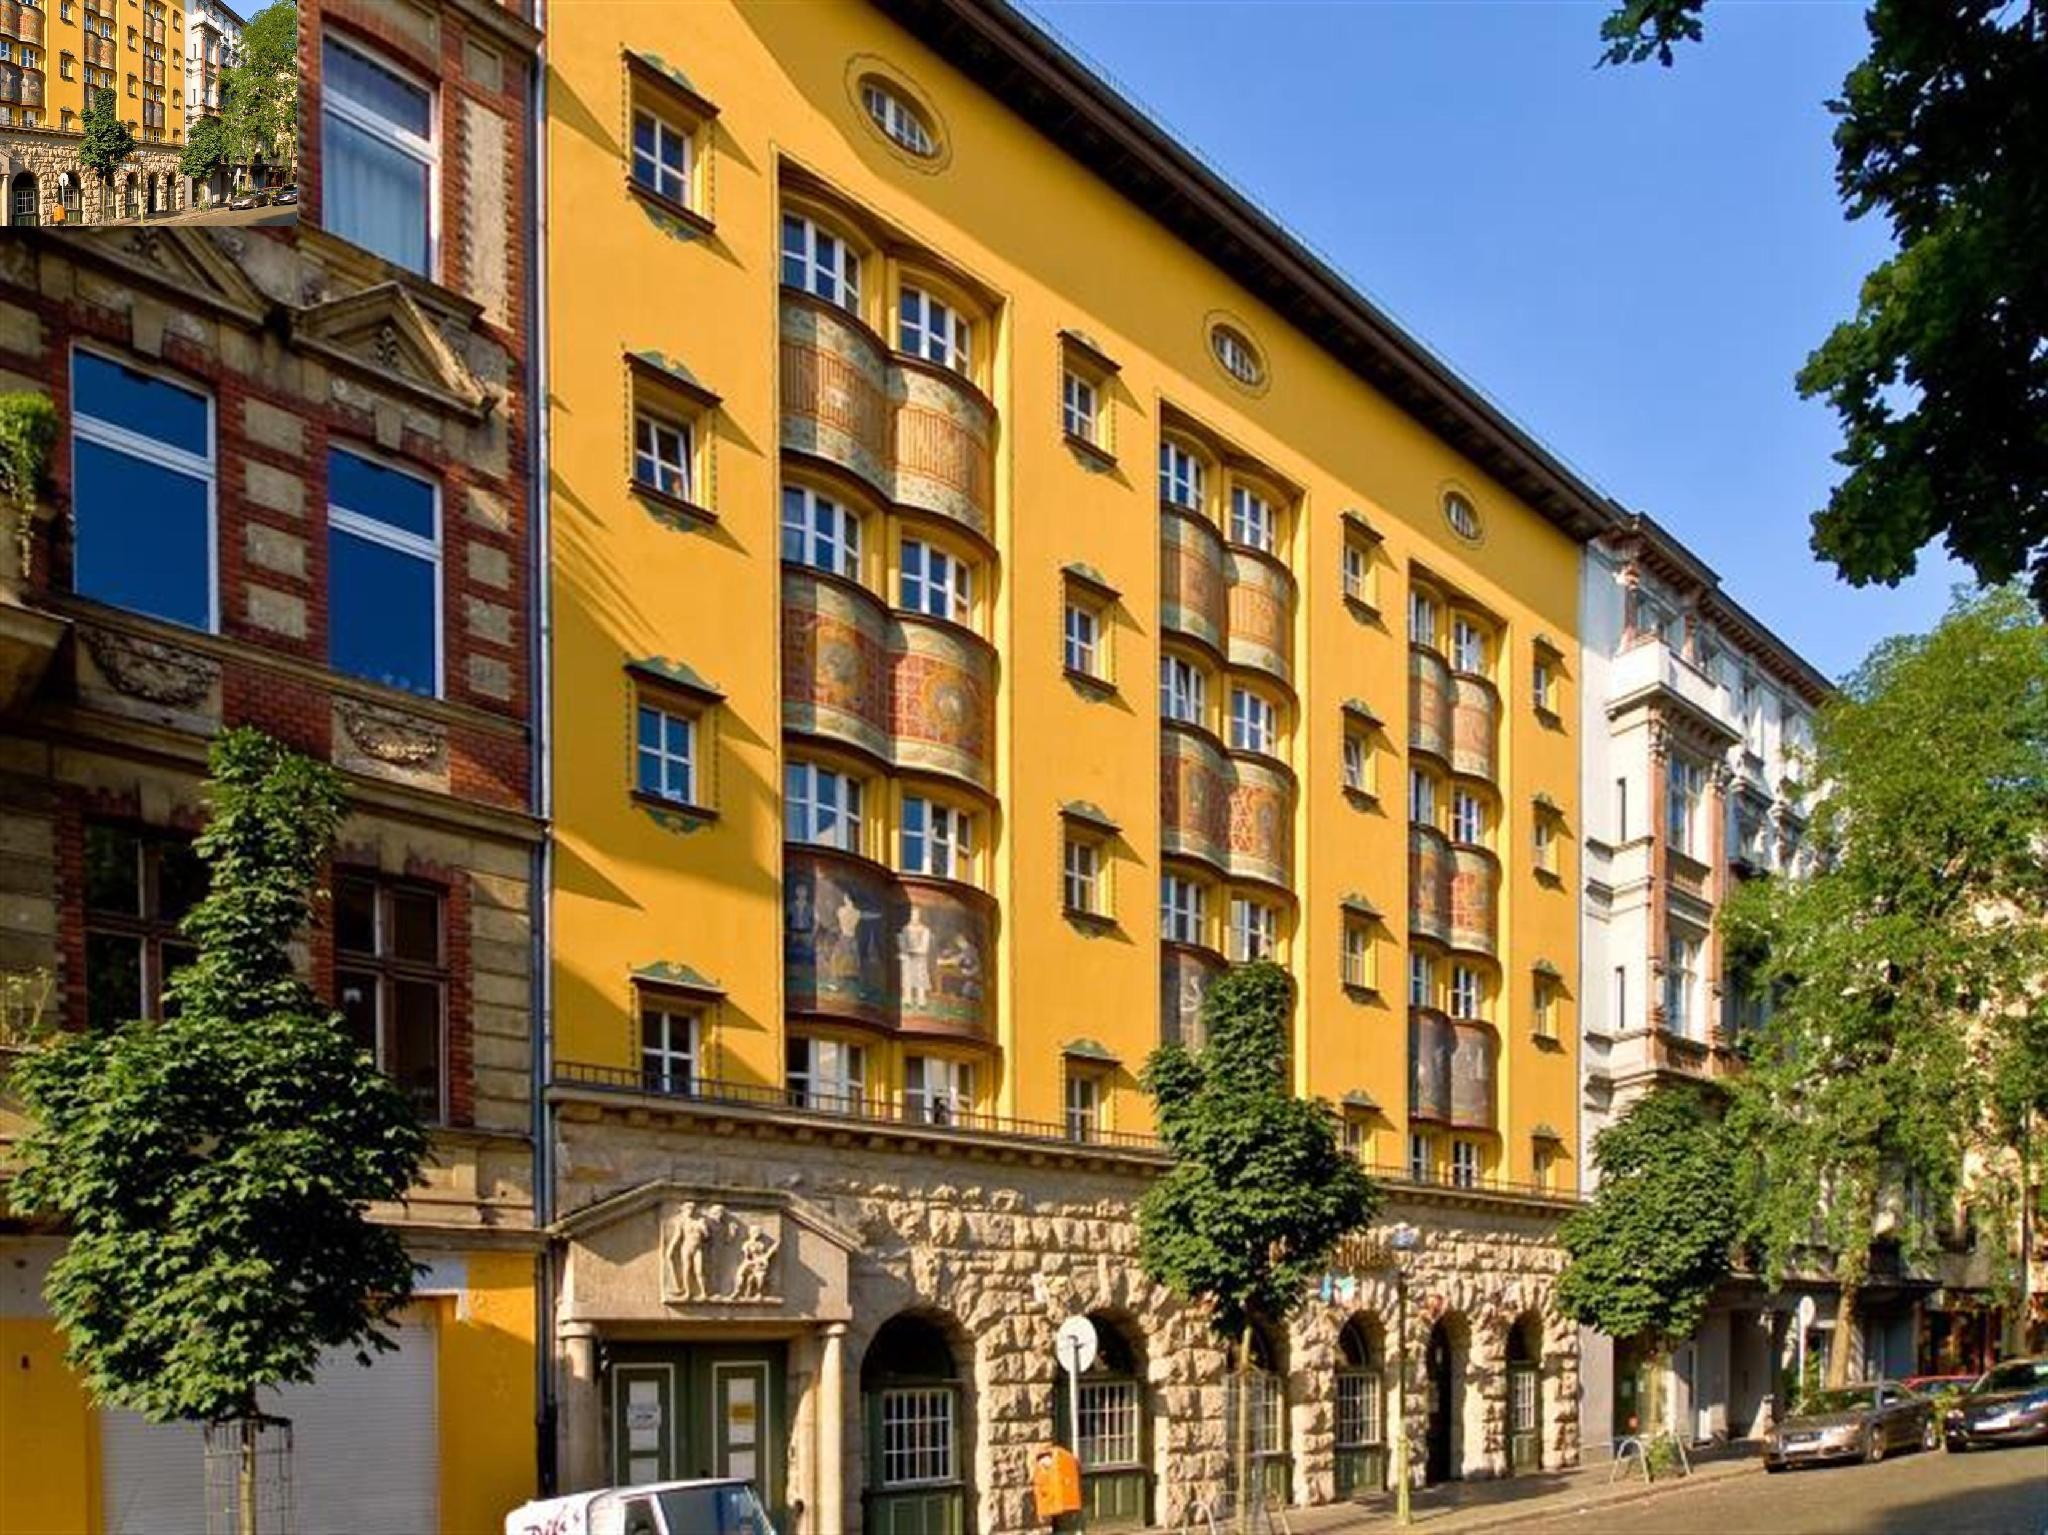 Amstel House Hostel - Hotell och Boende i Tyskland i Europa